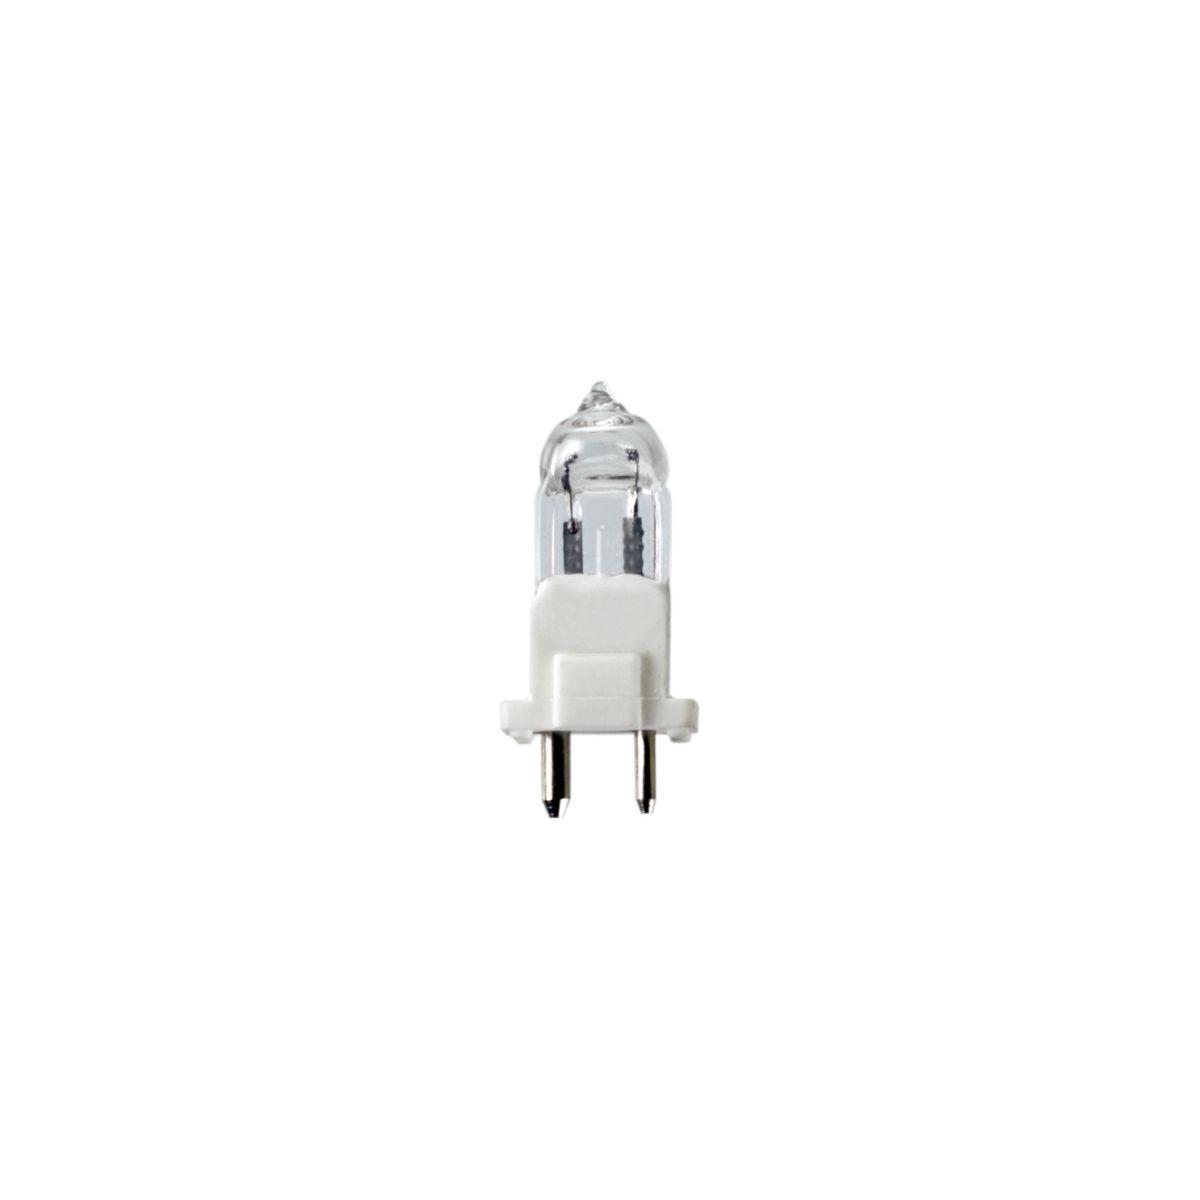 Ampoules halogènes - Osram / GE / Philips - HTI 150